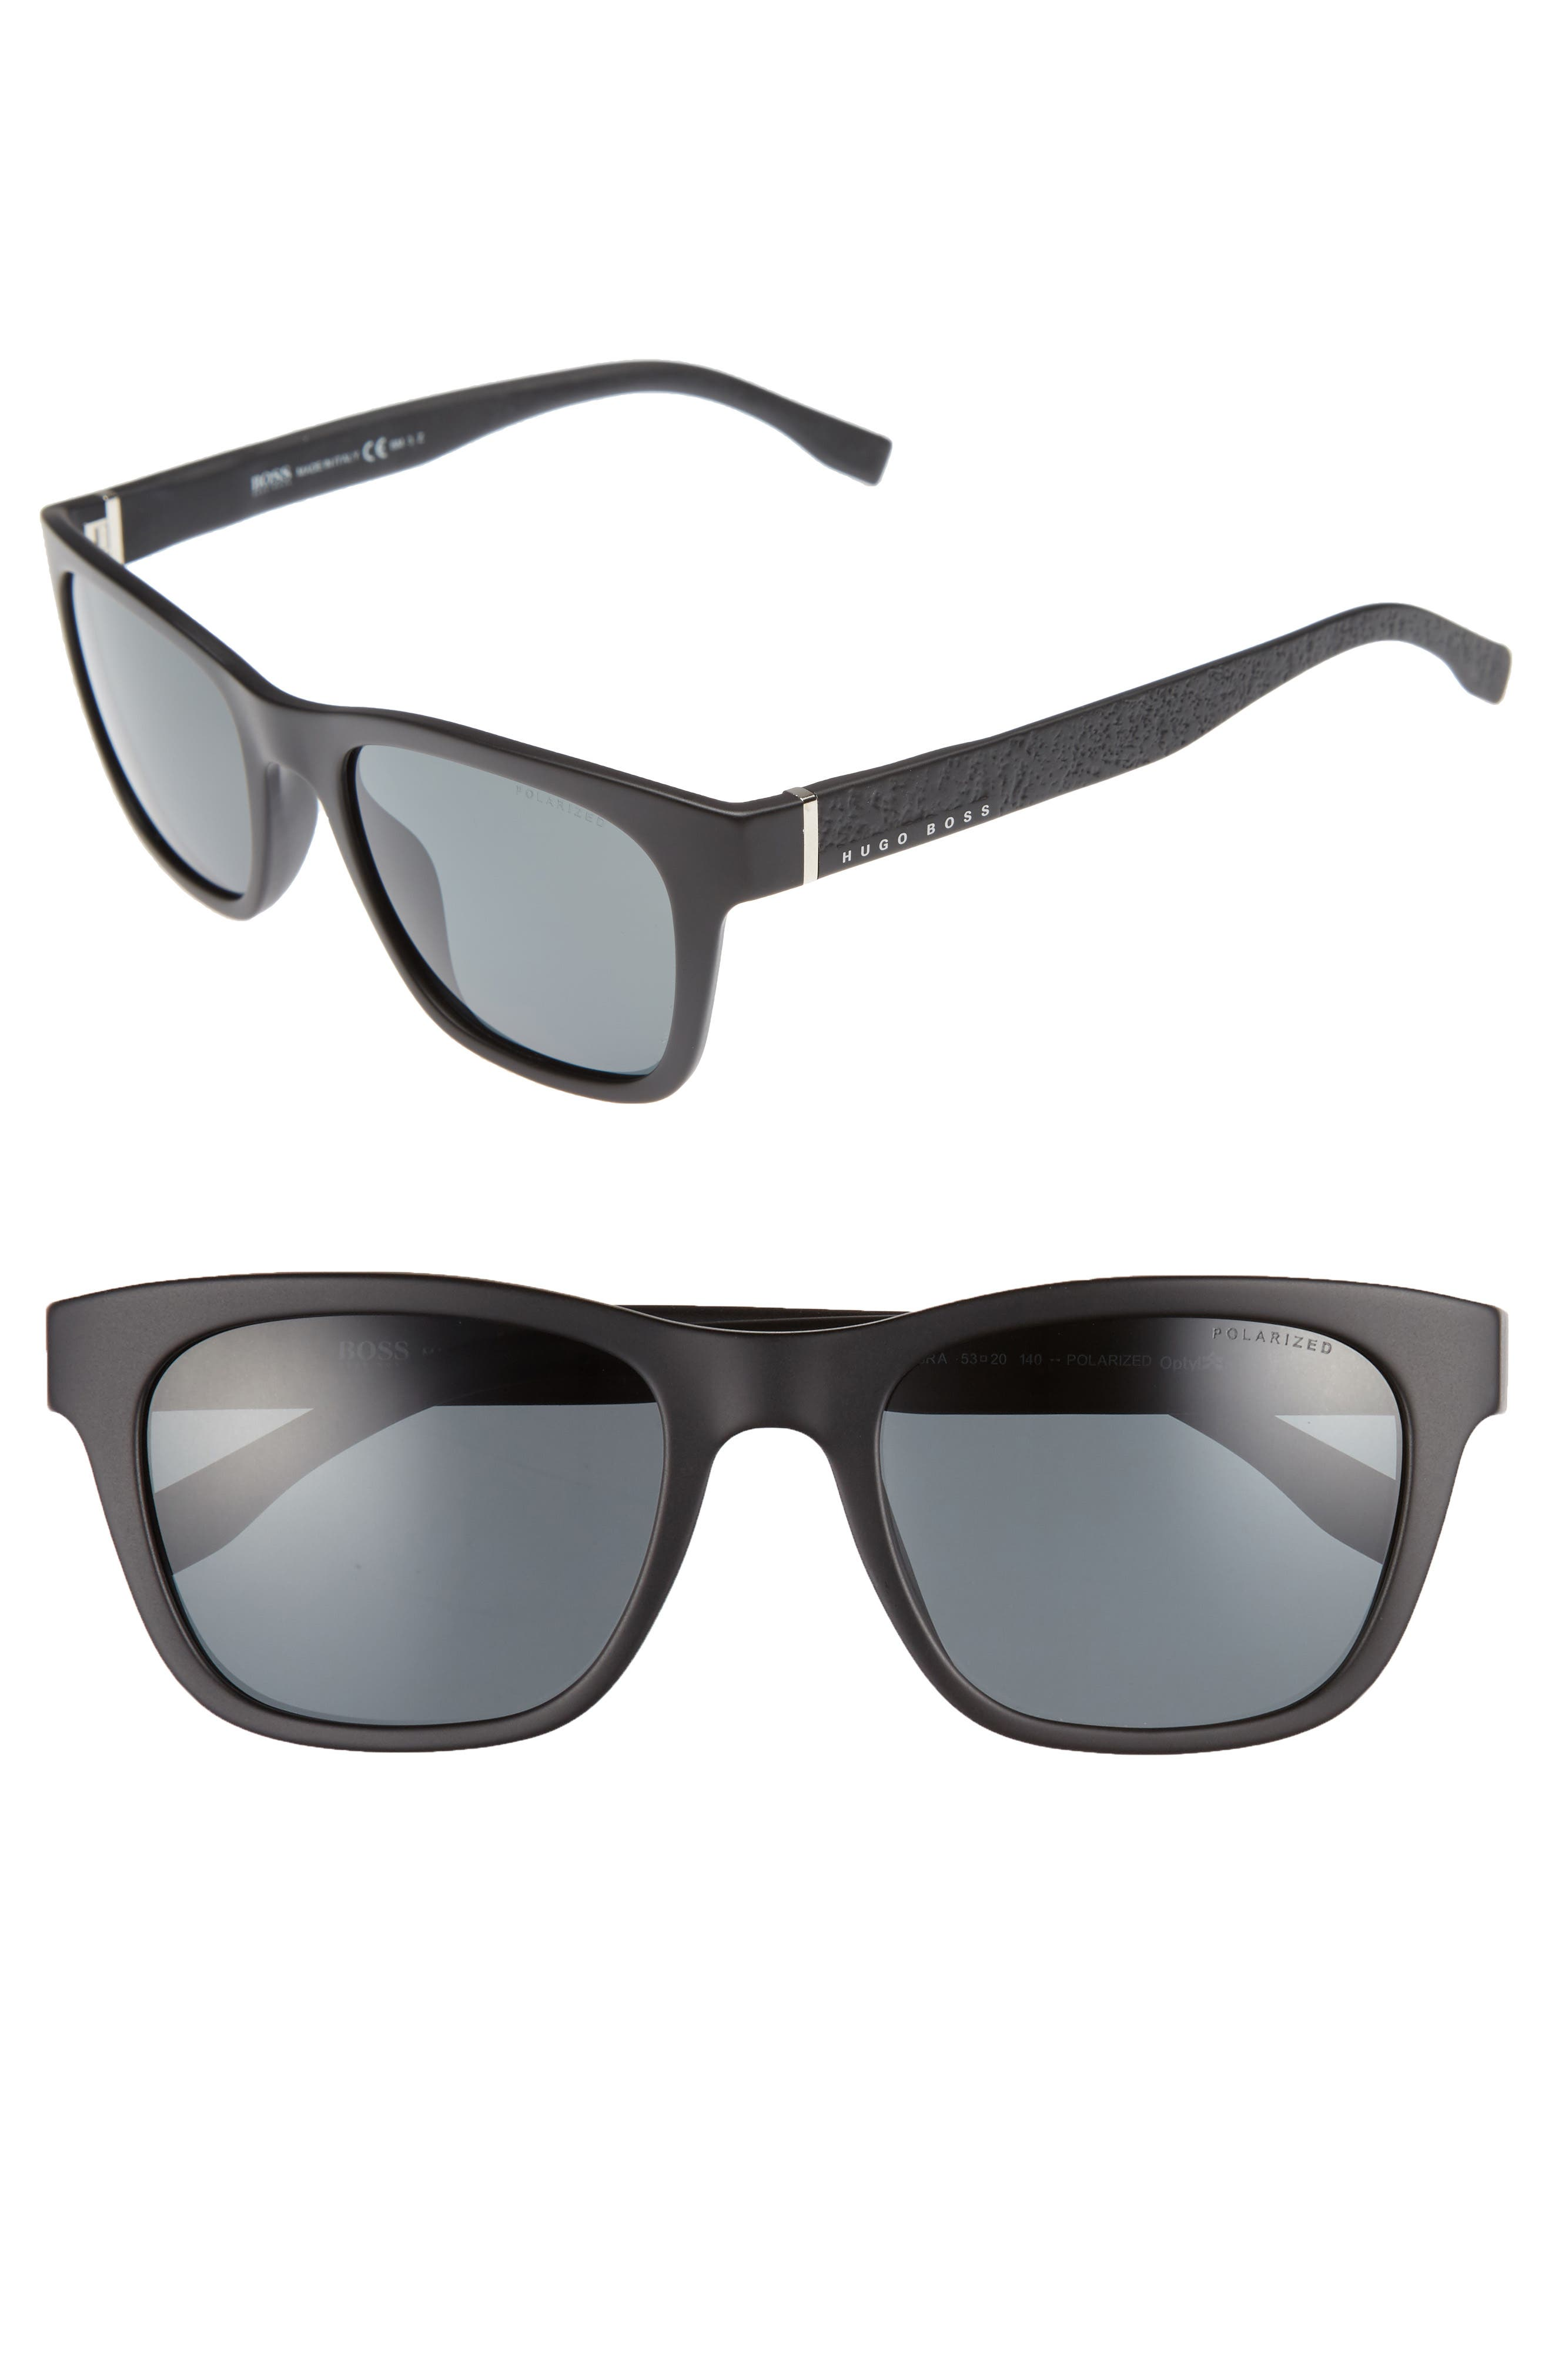 53mm Polarized Sunglasses,                             Main thumbnail 1, color,                             Matte Black/ Grey